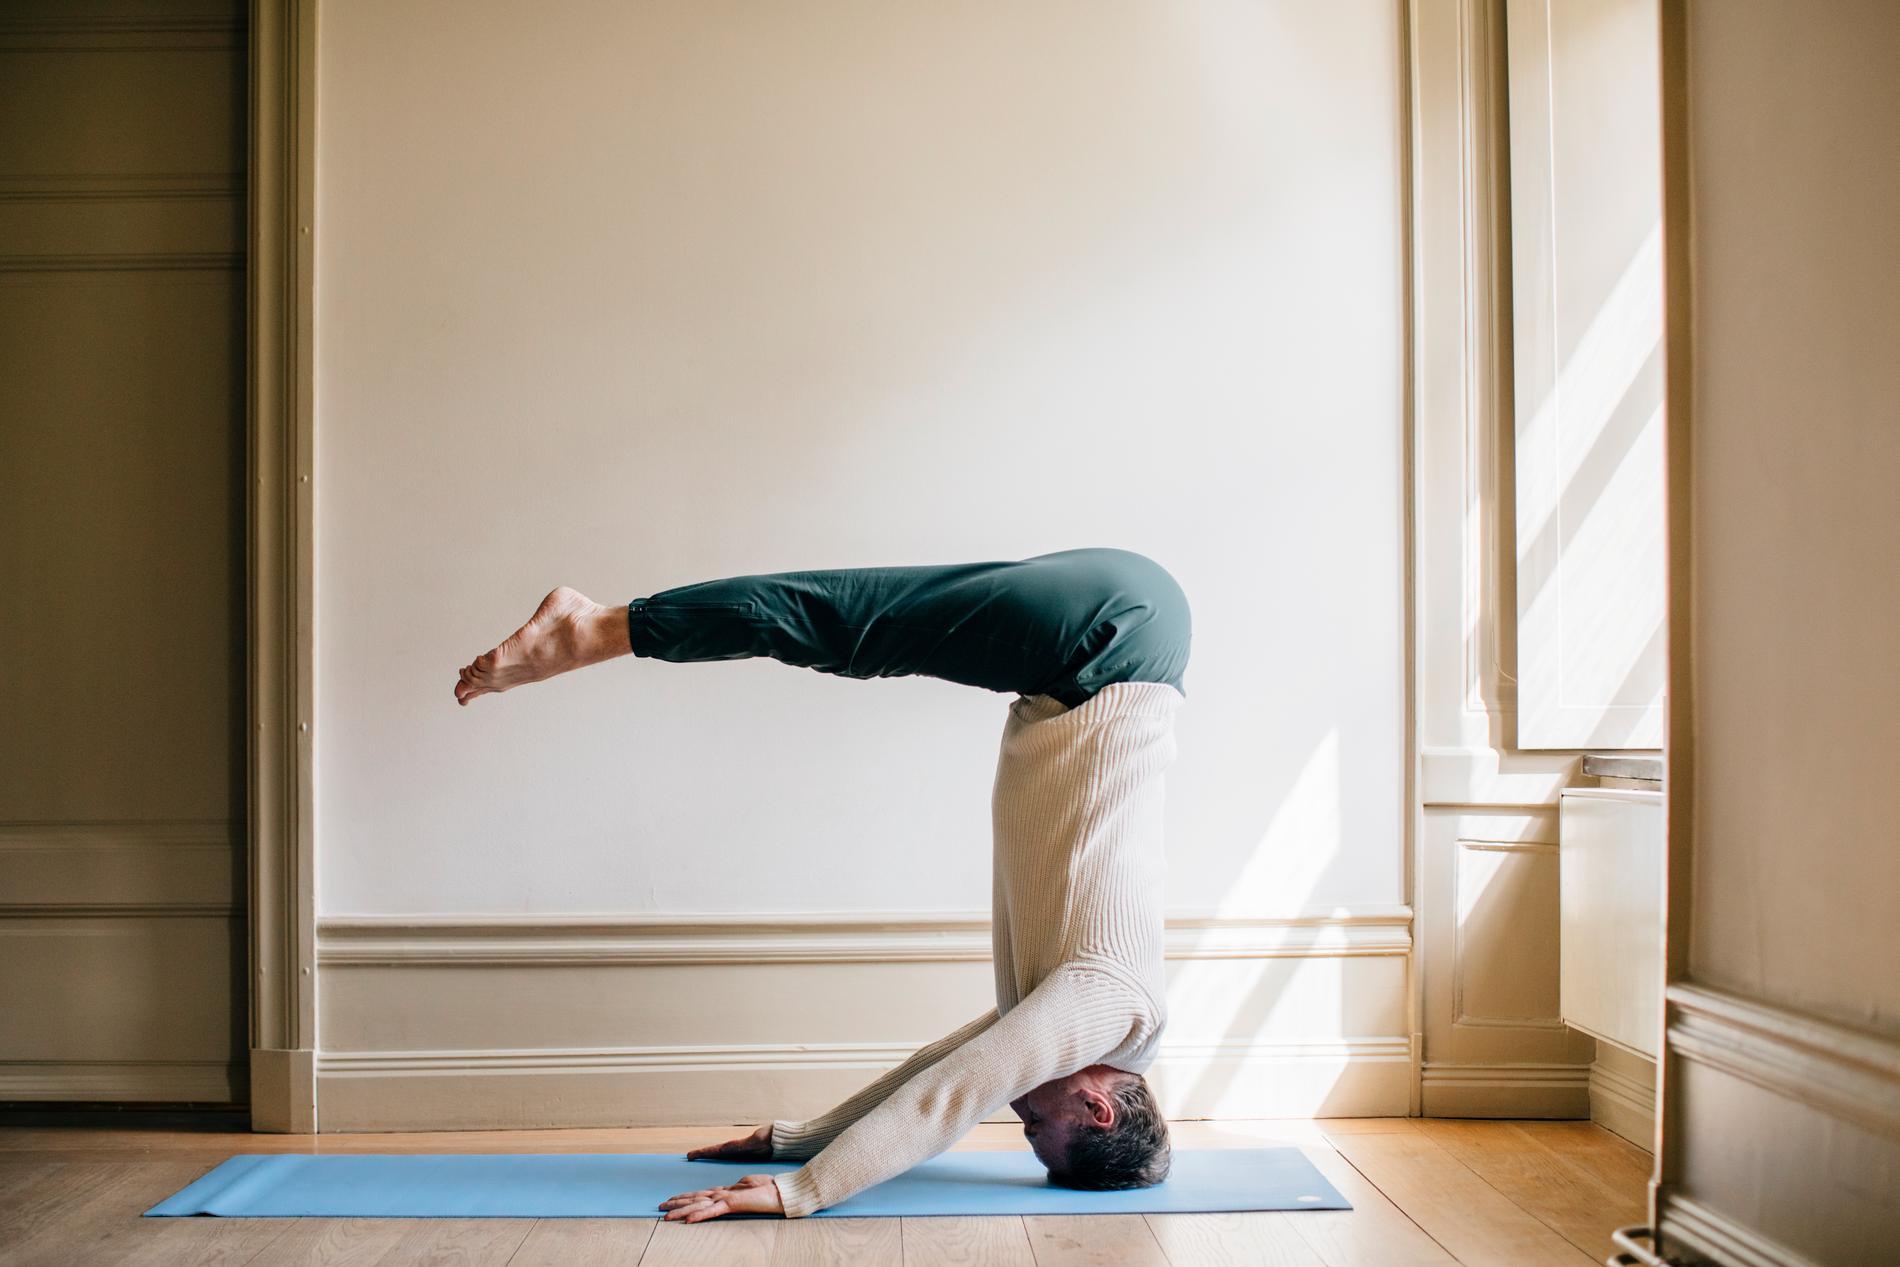 Manduka prolite yogamatta